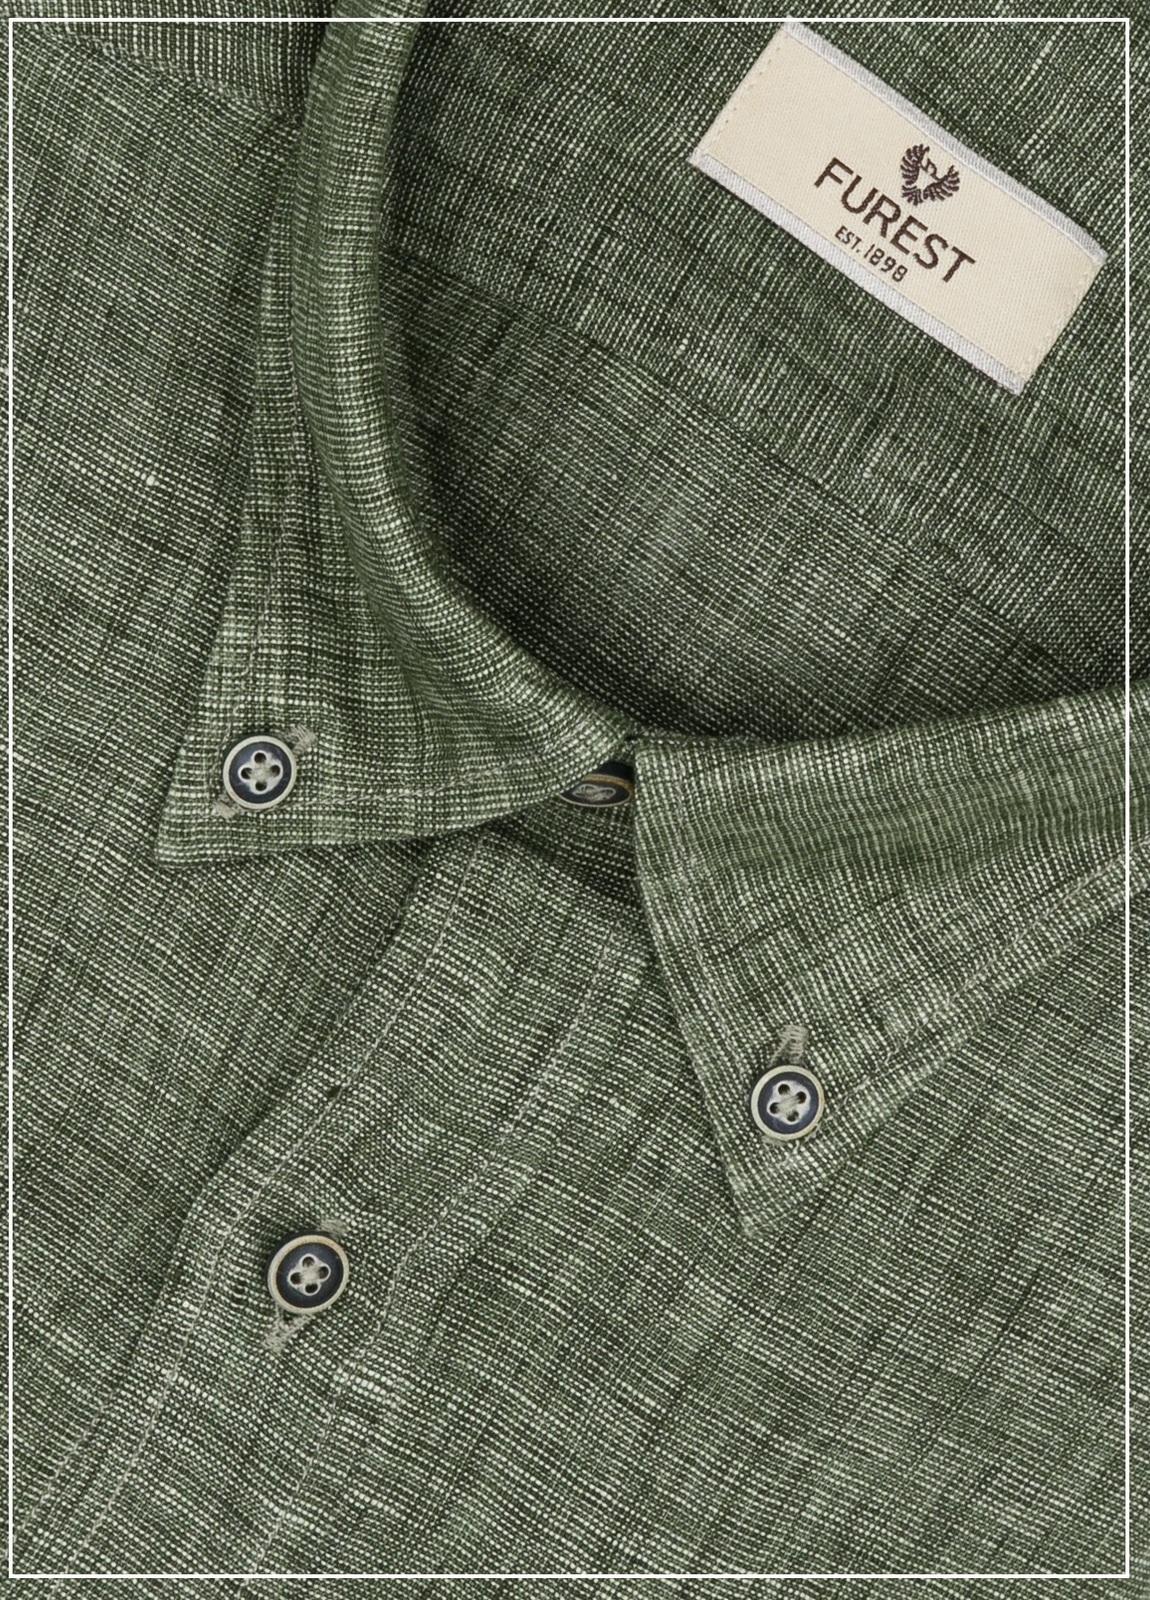 Camisa Leisure Wear REGULAR FIT Modelo BOTTON DOWN color verde, 100% Lino. - Ítem1